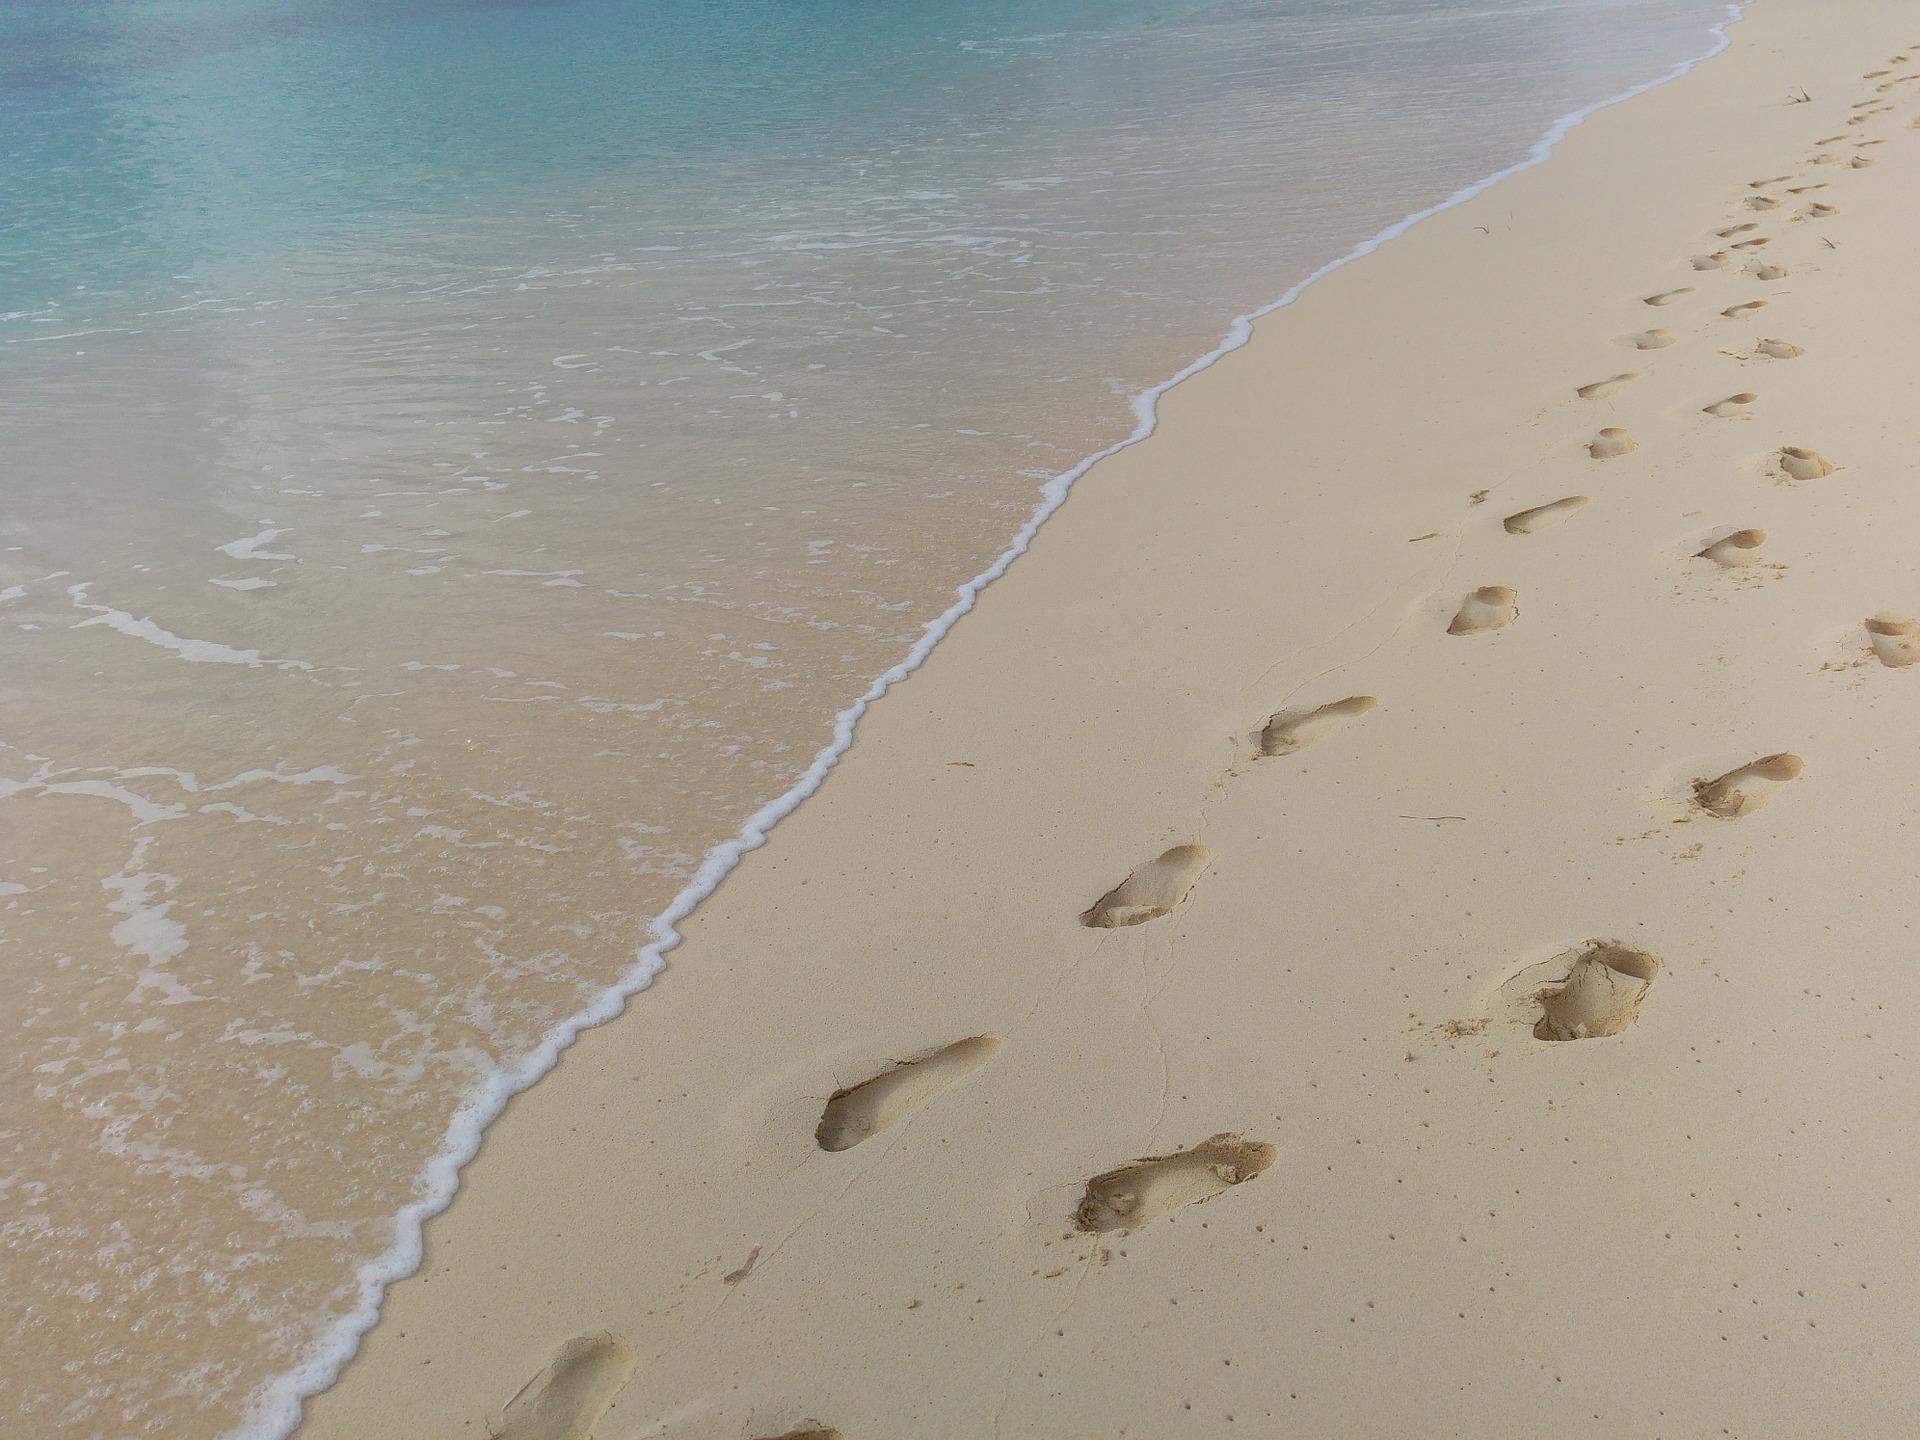 footprints-1145883_1920